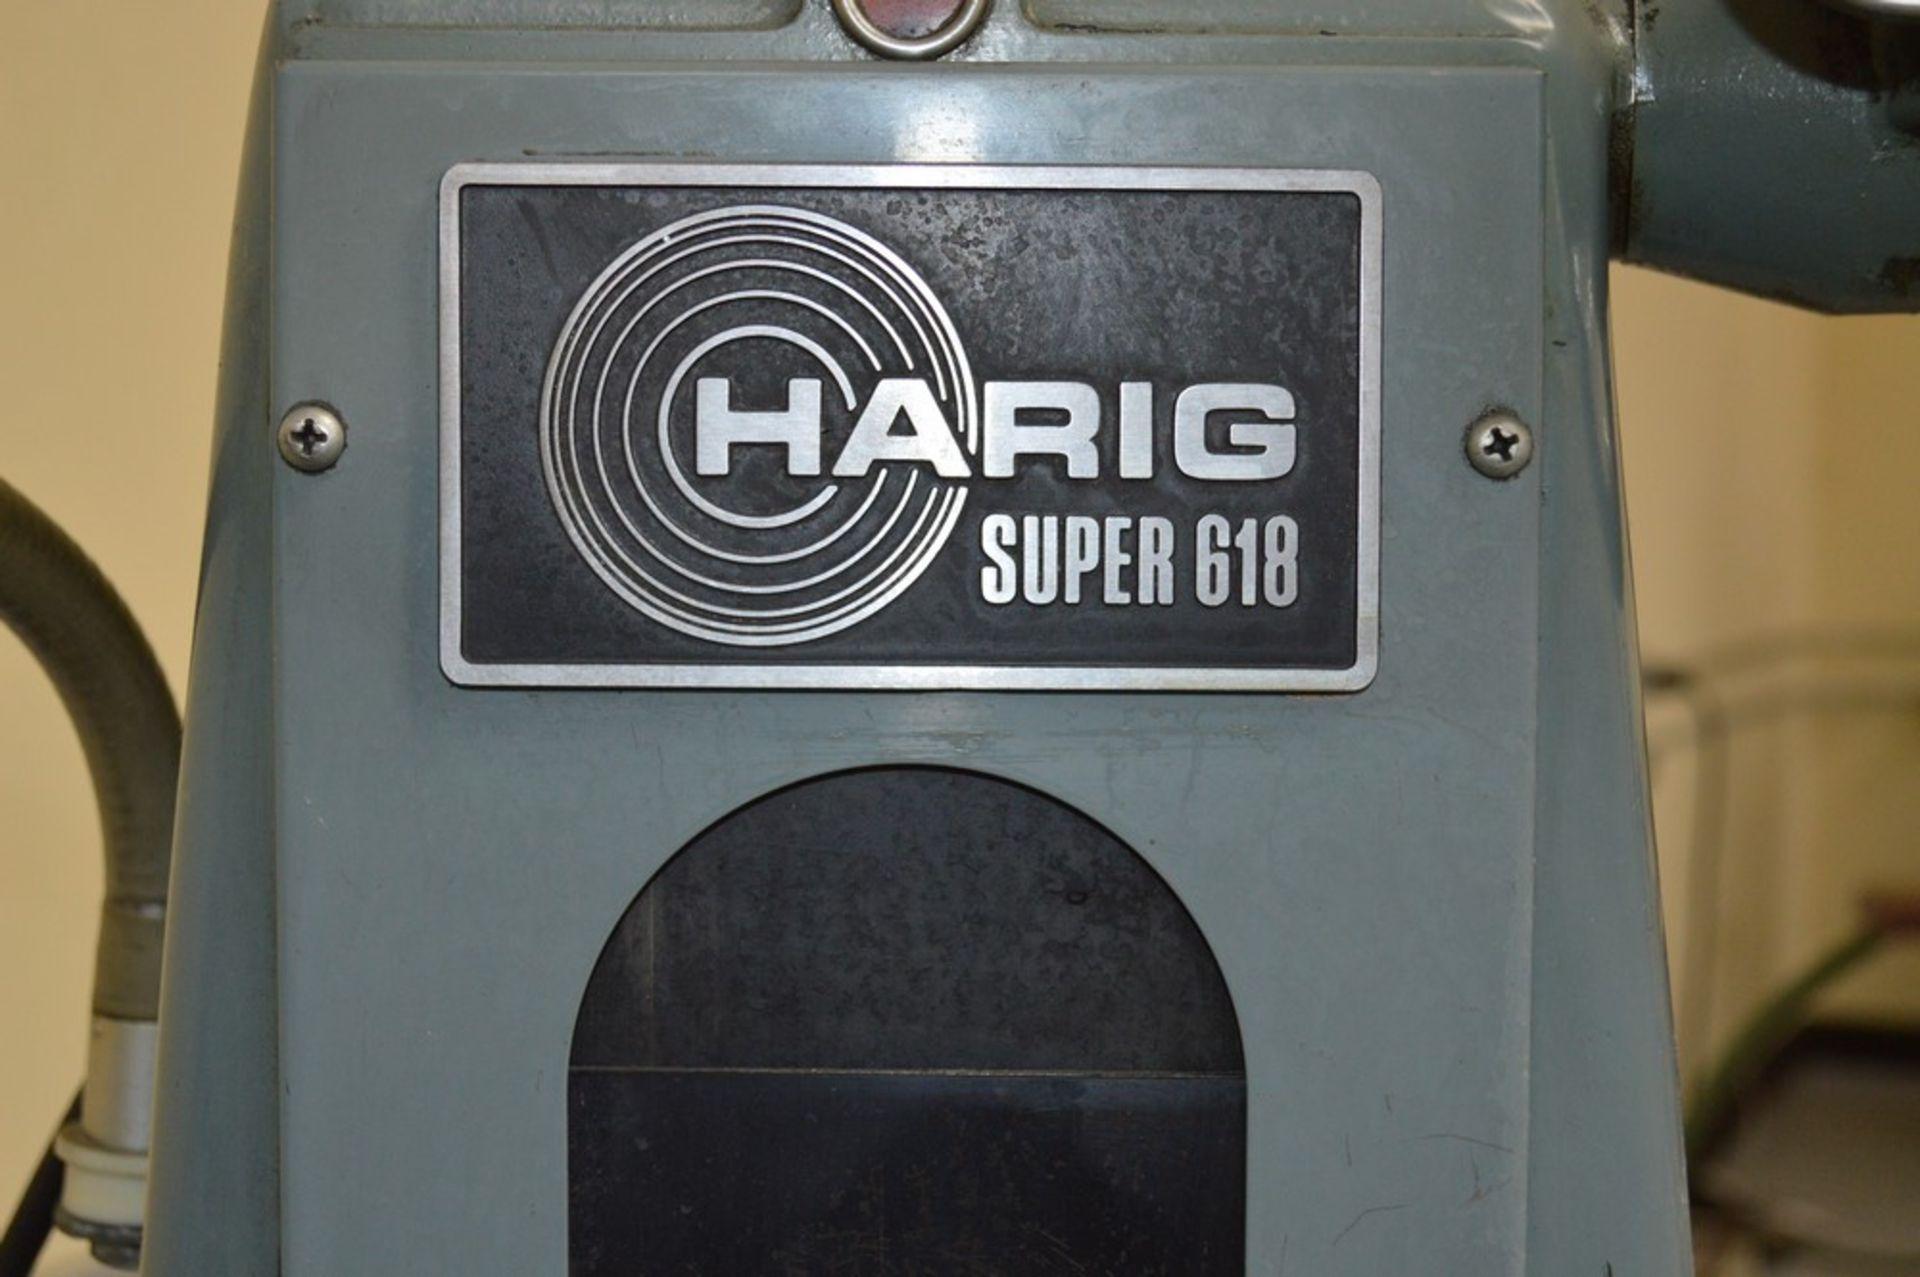 Harig Super 618, magnalock chuck, teflon ways, coolant - Image 6 of 9